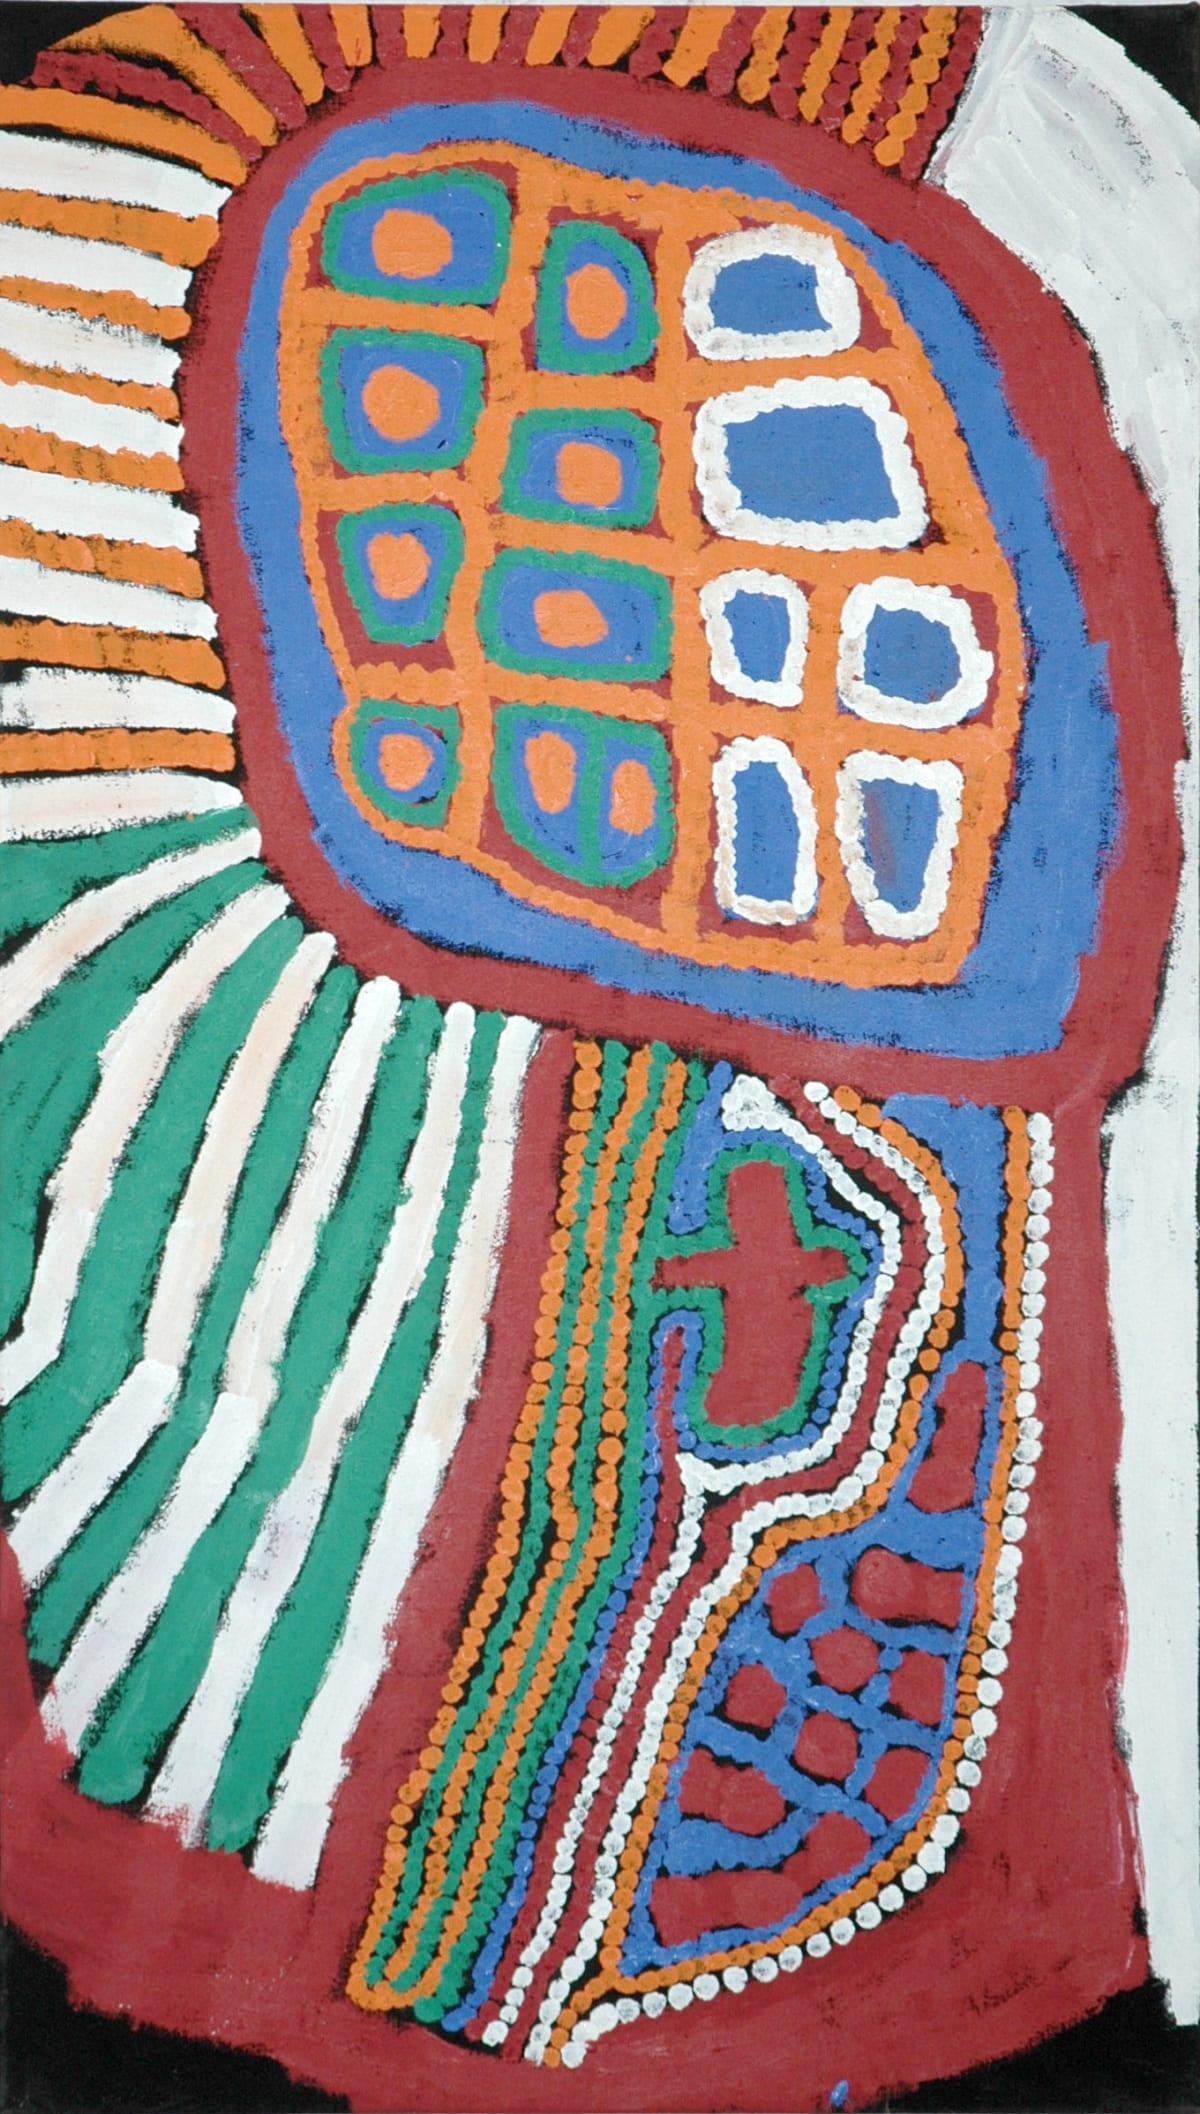 Weaver Jack Lungarung acrylic on linen 106.5 x 60 cm